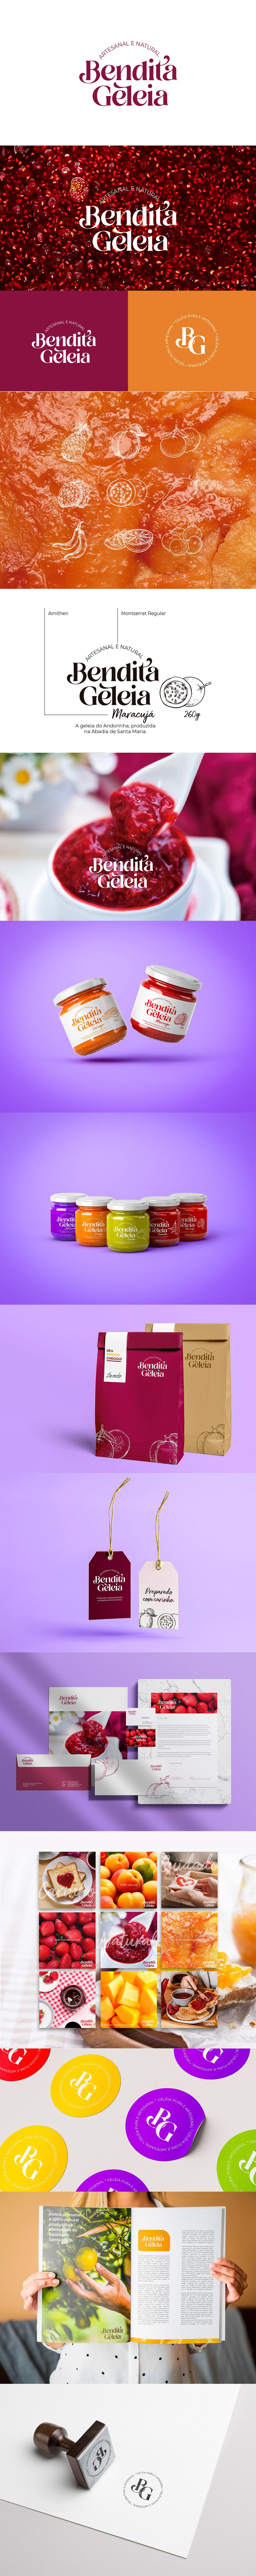 branding  design gráfico id class identidade visual Logotipo Packaging